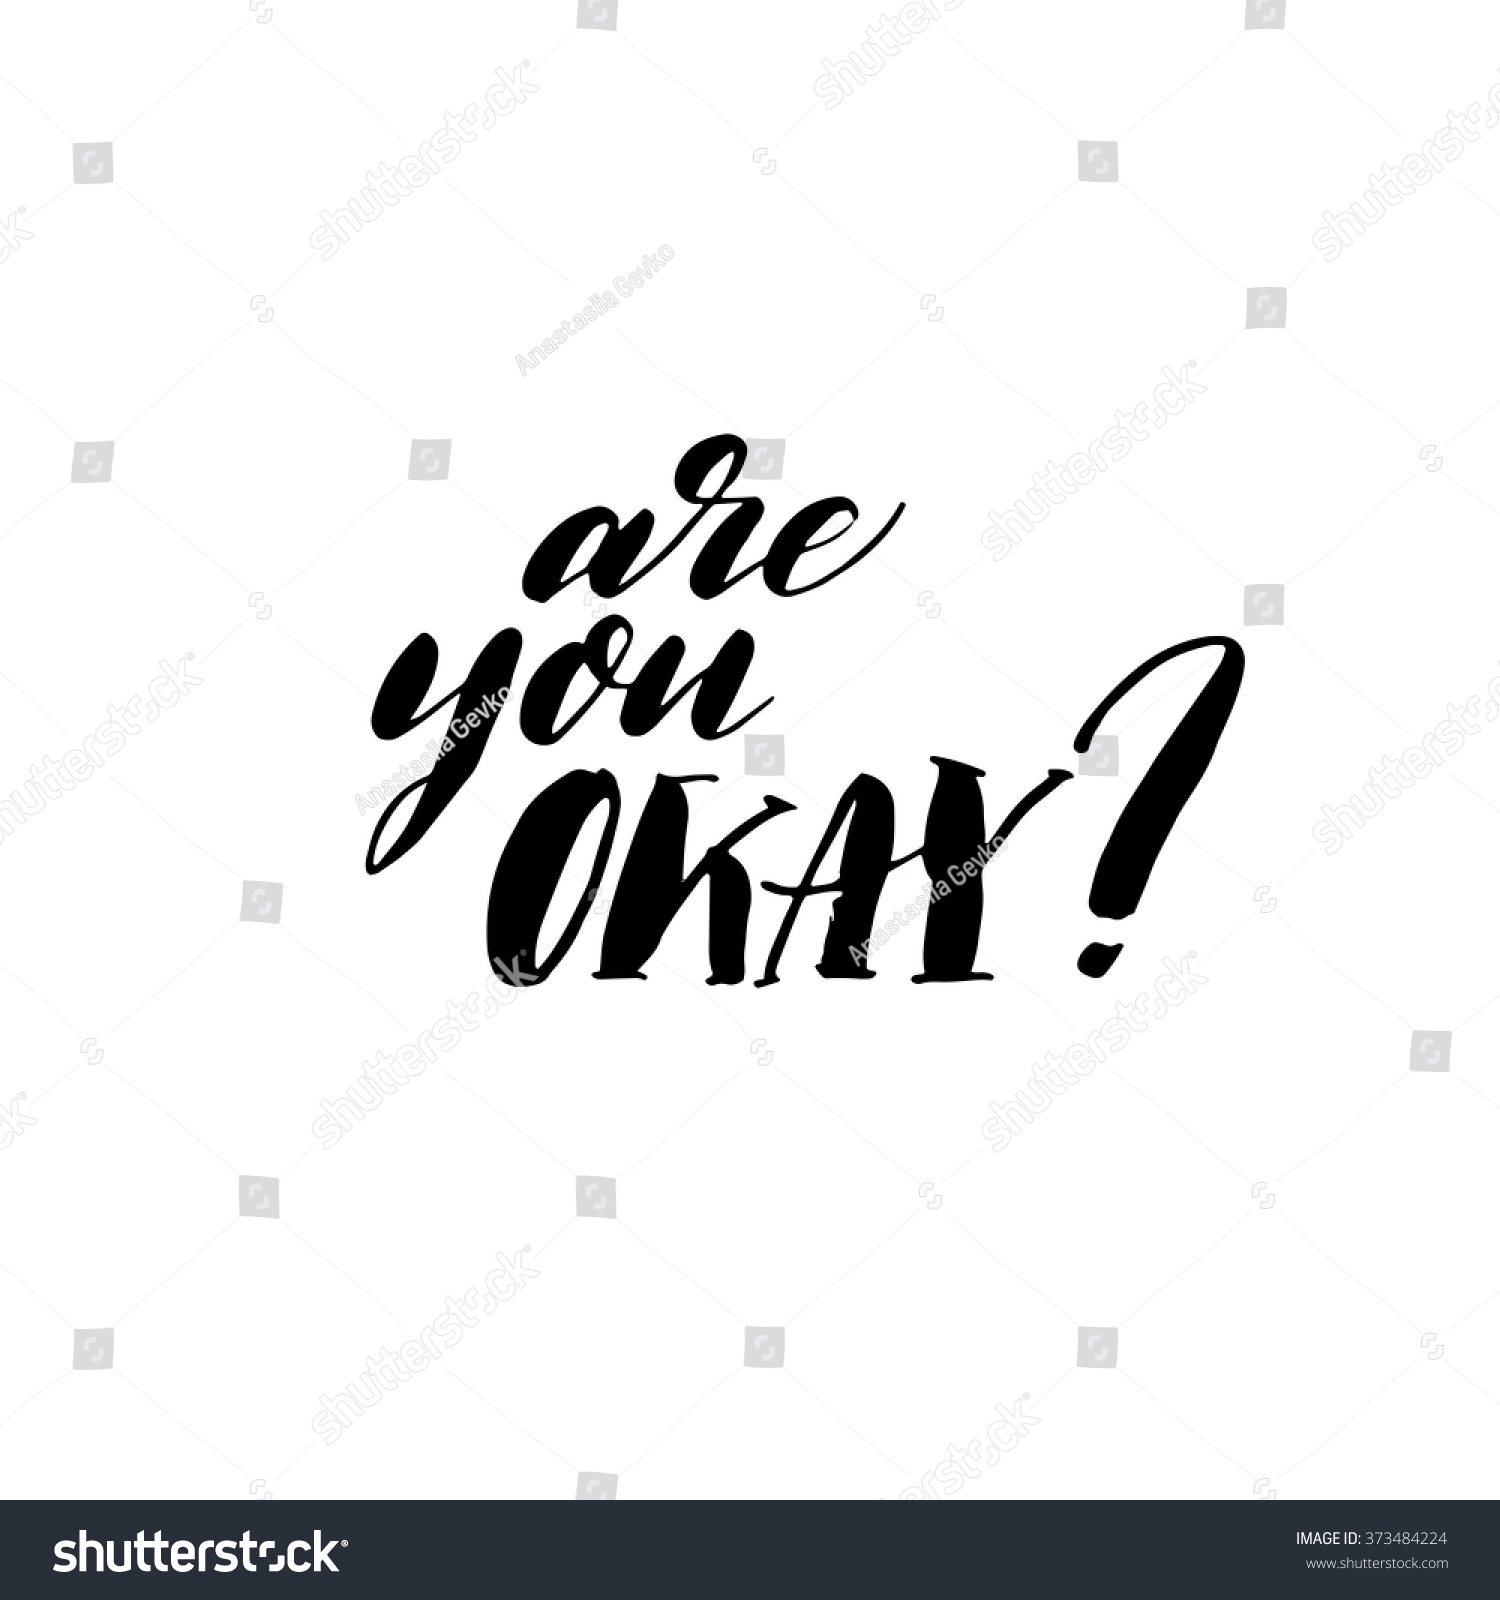 are you ok - photo #30